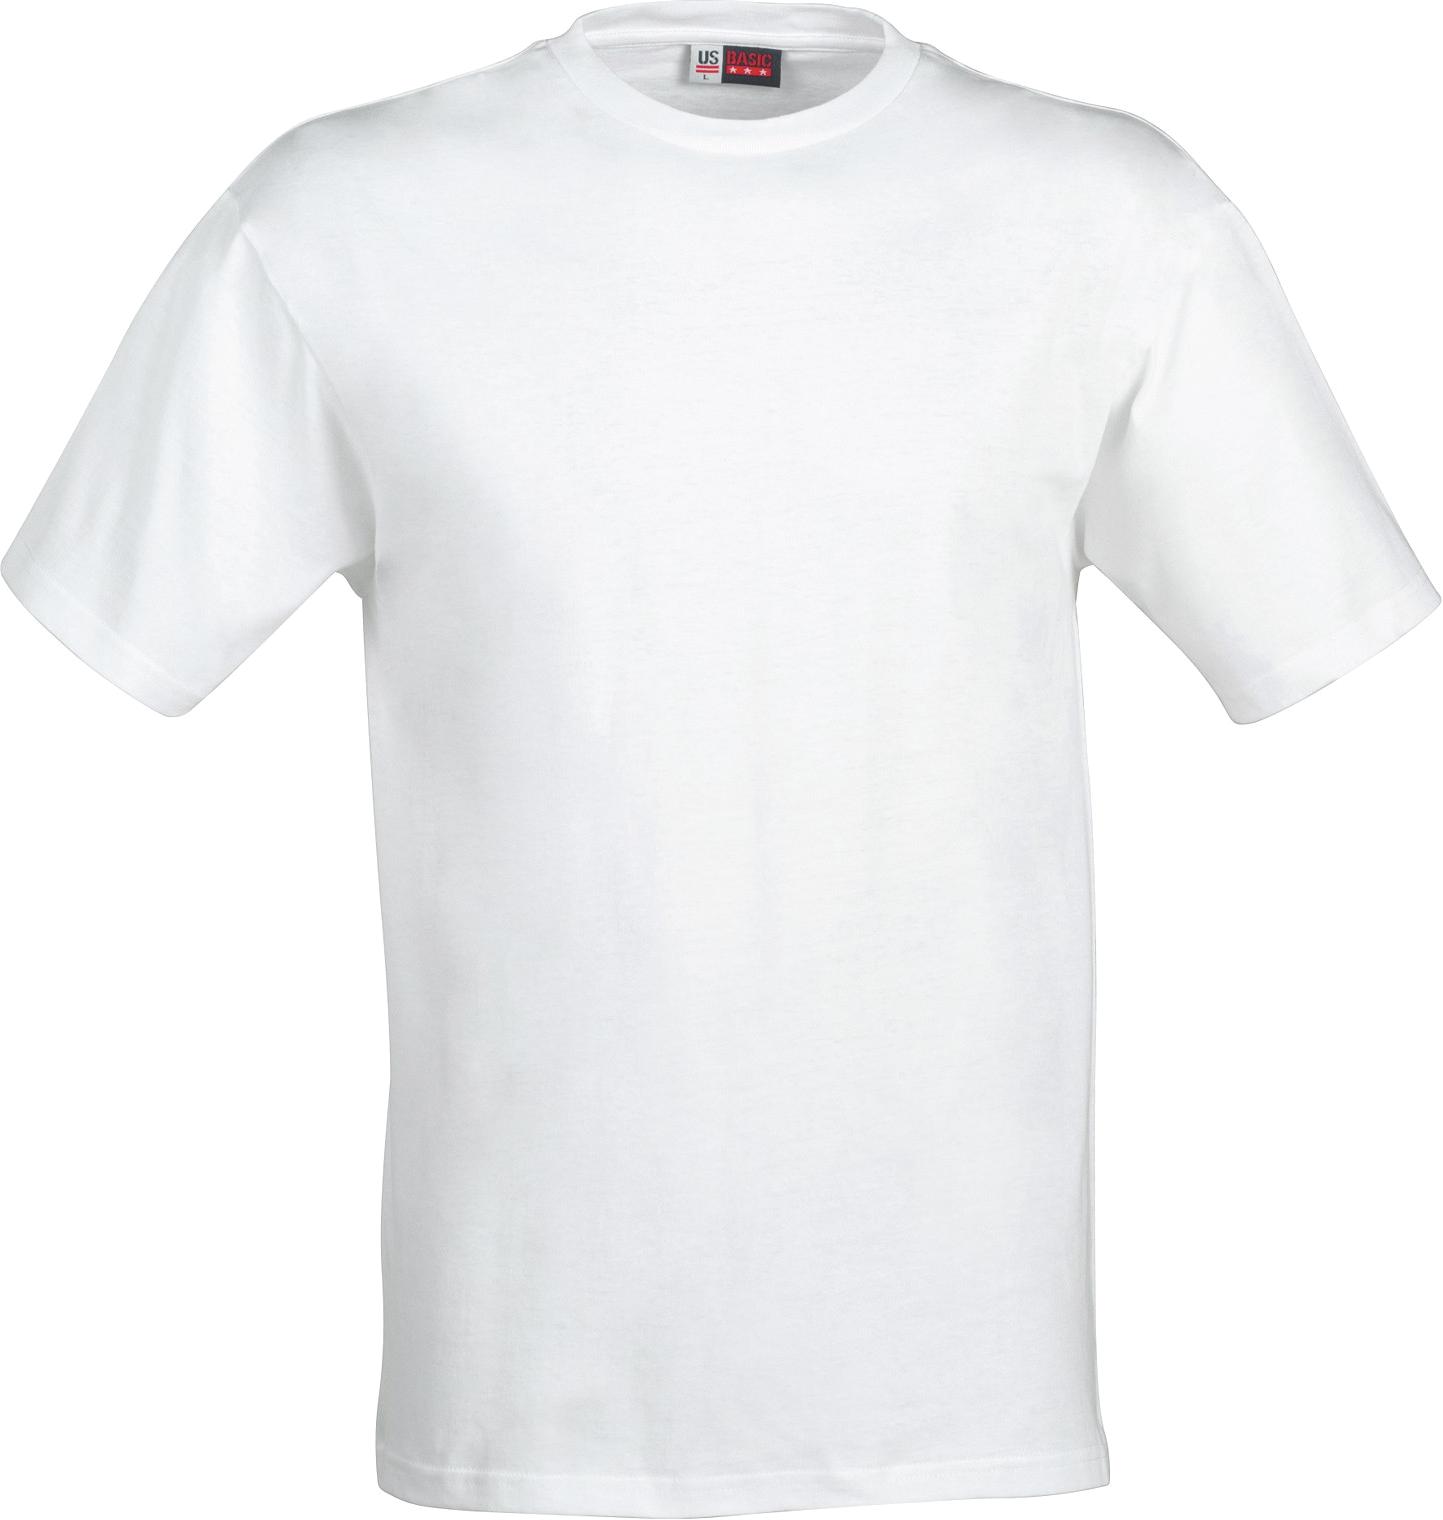 Pin By Next On Raddaskarmen T Shirt Png White Tshirt White Tee Shirts